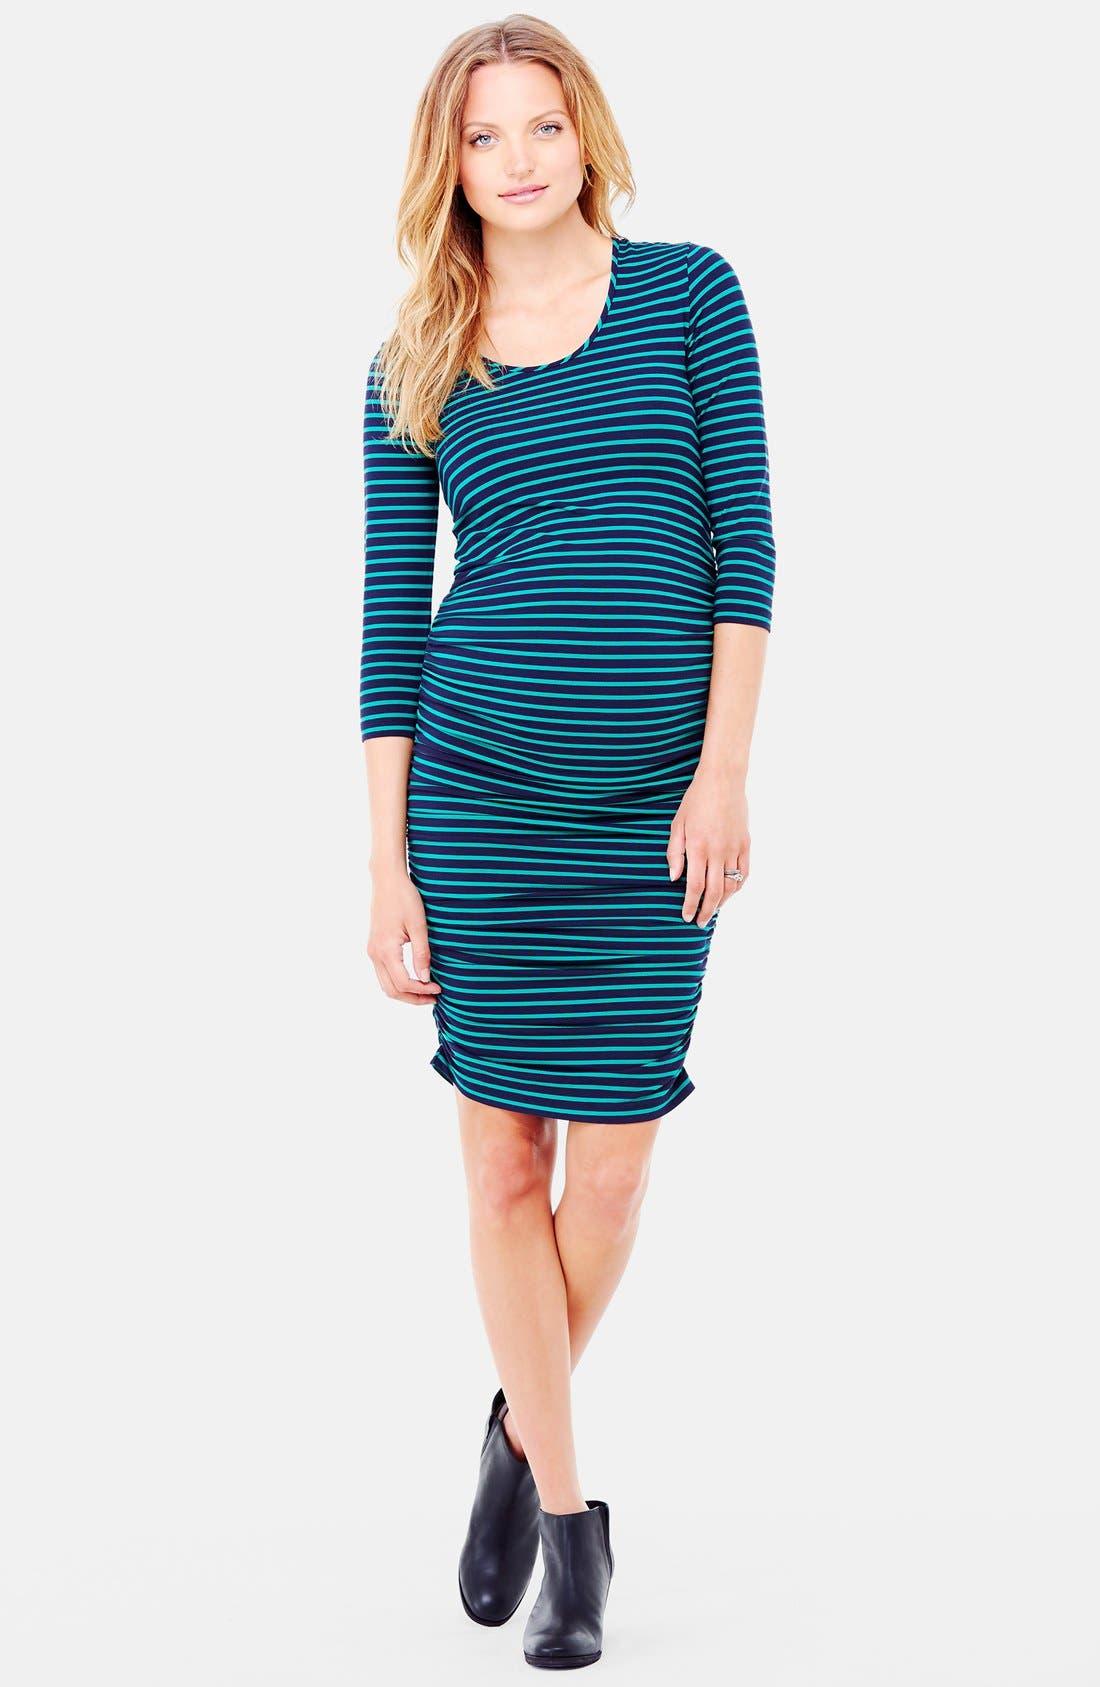 Womens maternity dresses nordstrom ombrellifo Gallery